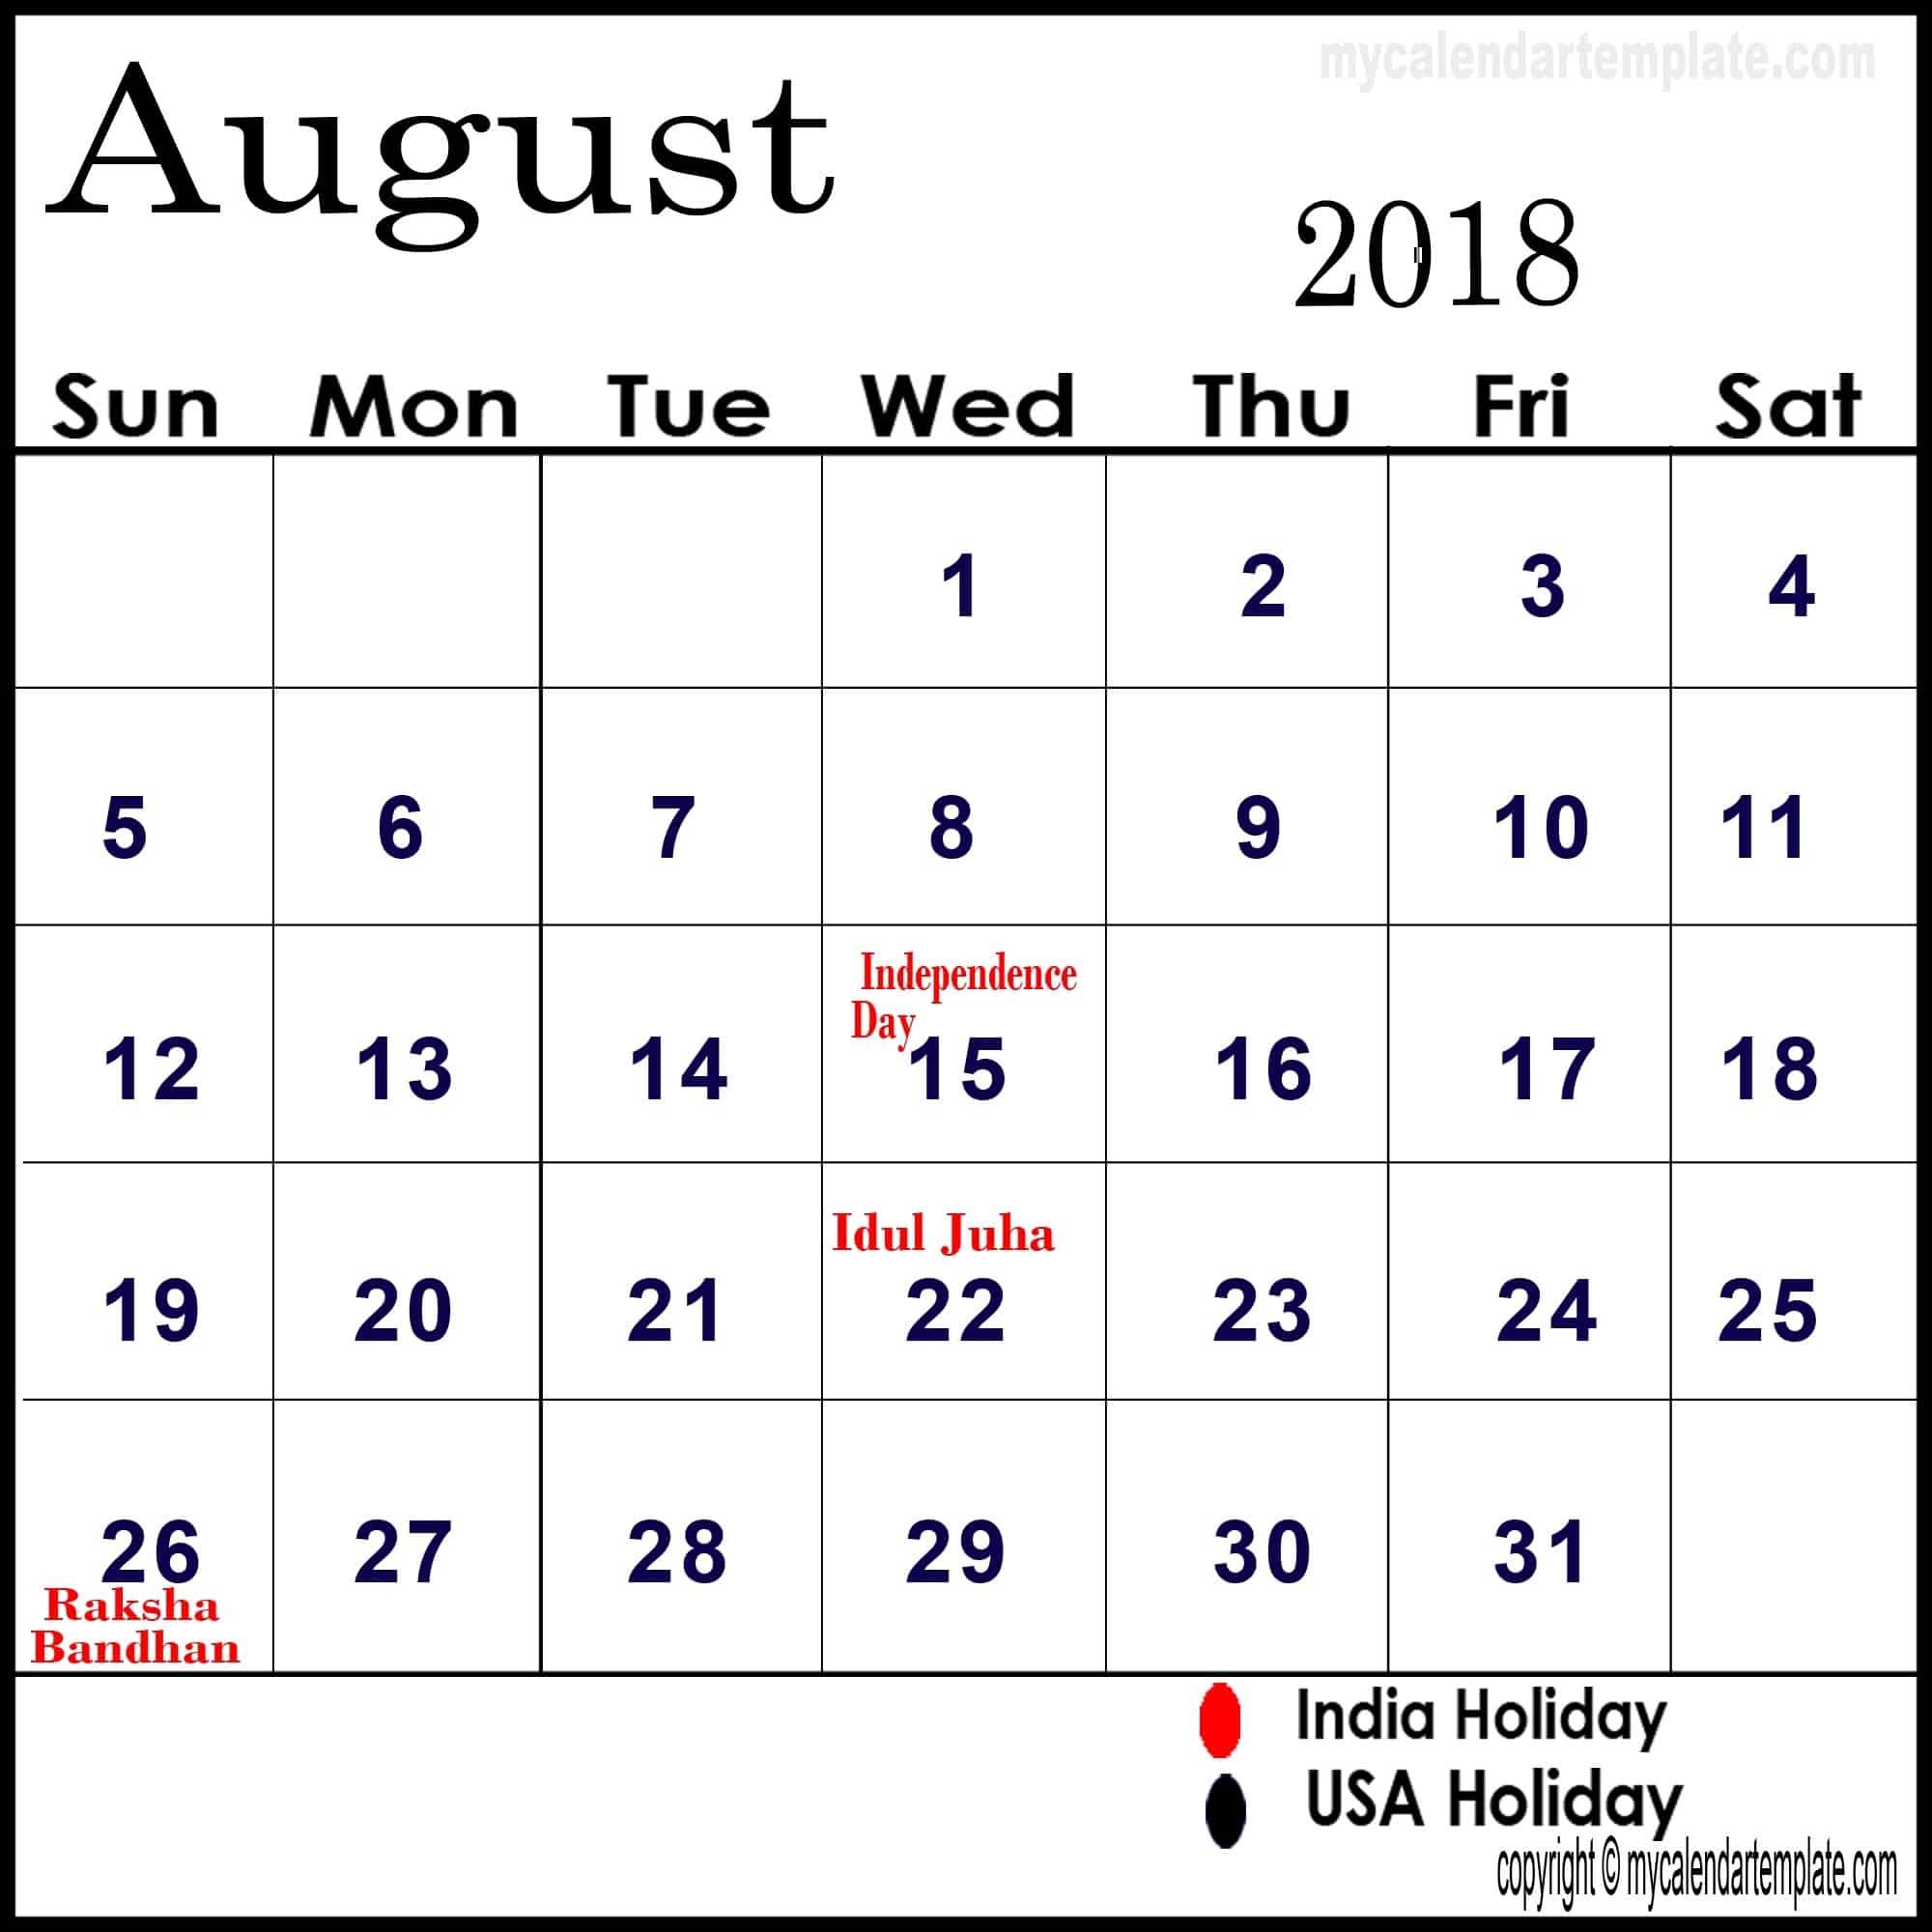 August 2018 Calendar With Holidays | Calendar Monthly Printable regarding August 2018 Calendar With Holidays